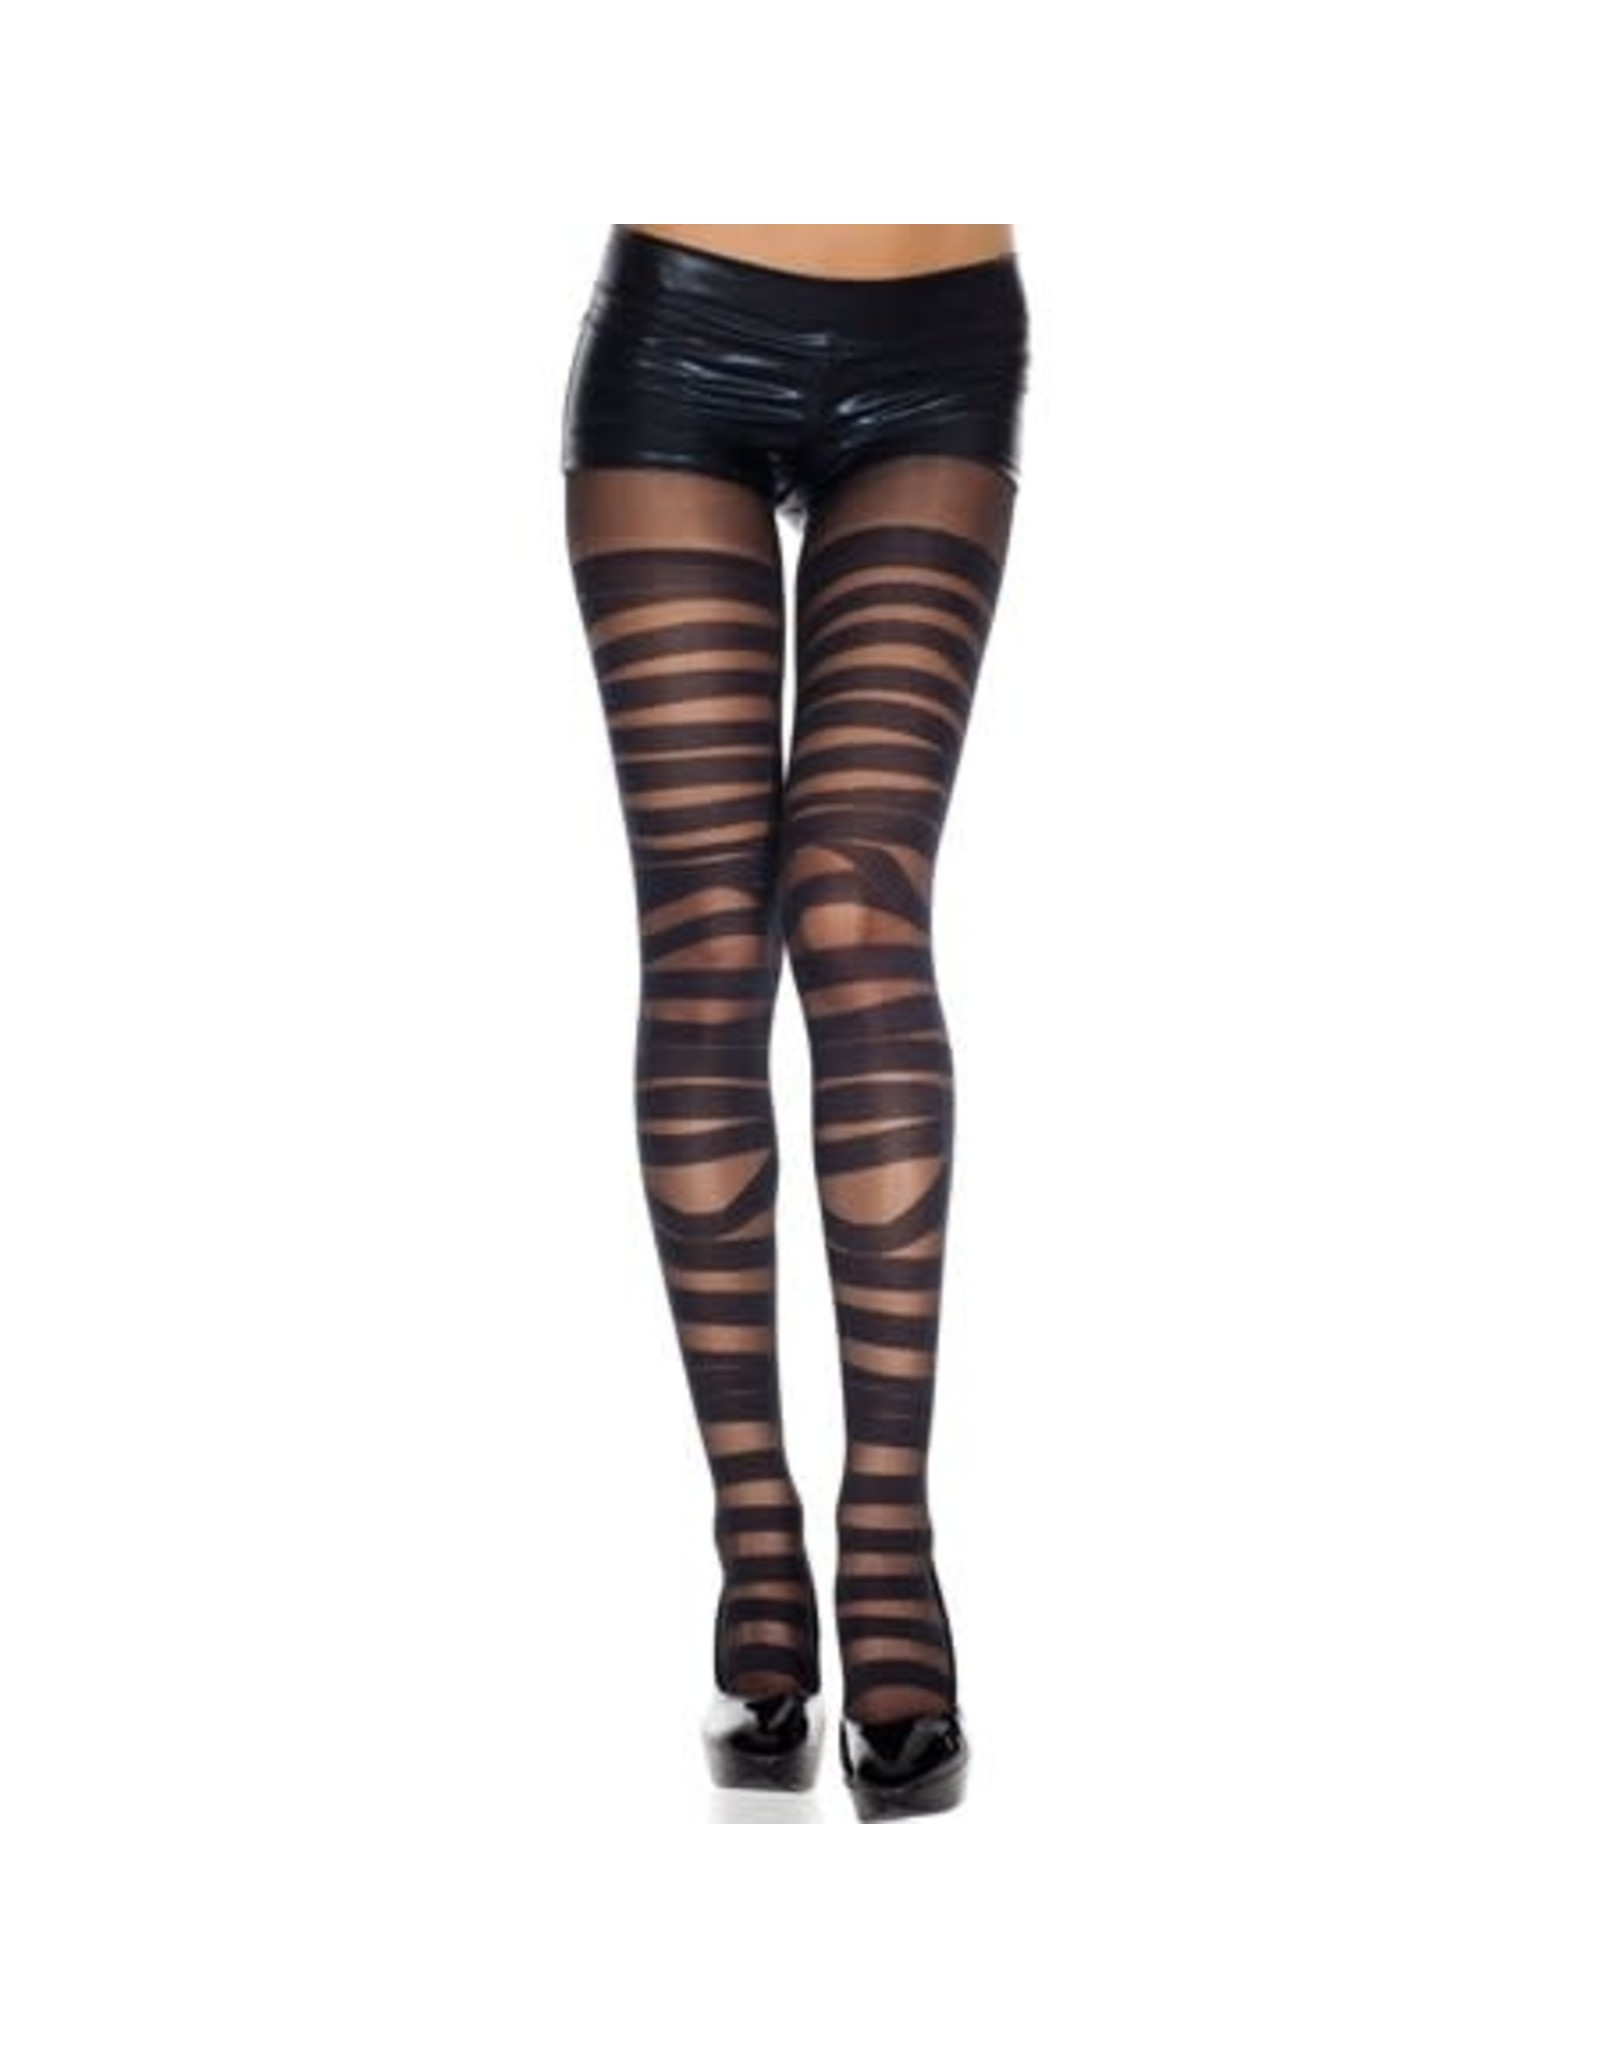 MUSIC LEGS - Spandex Sheer Opaque Bandage Design Pantyhose